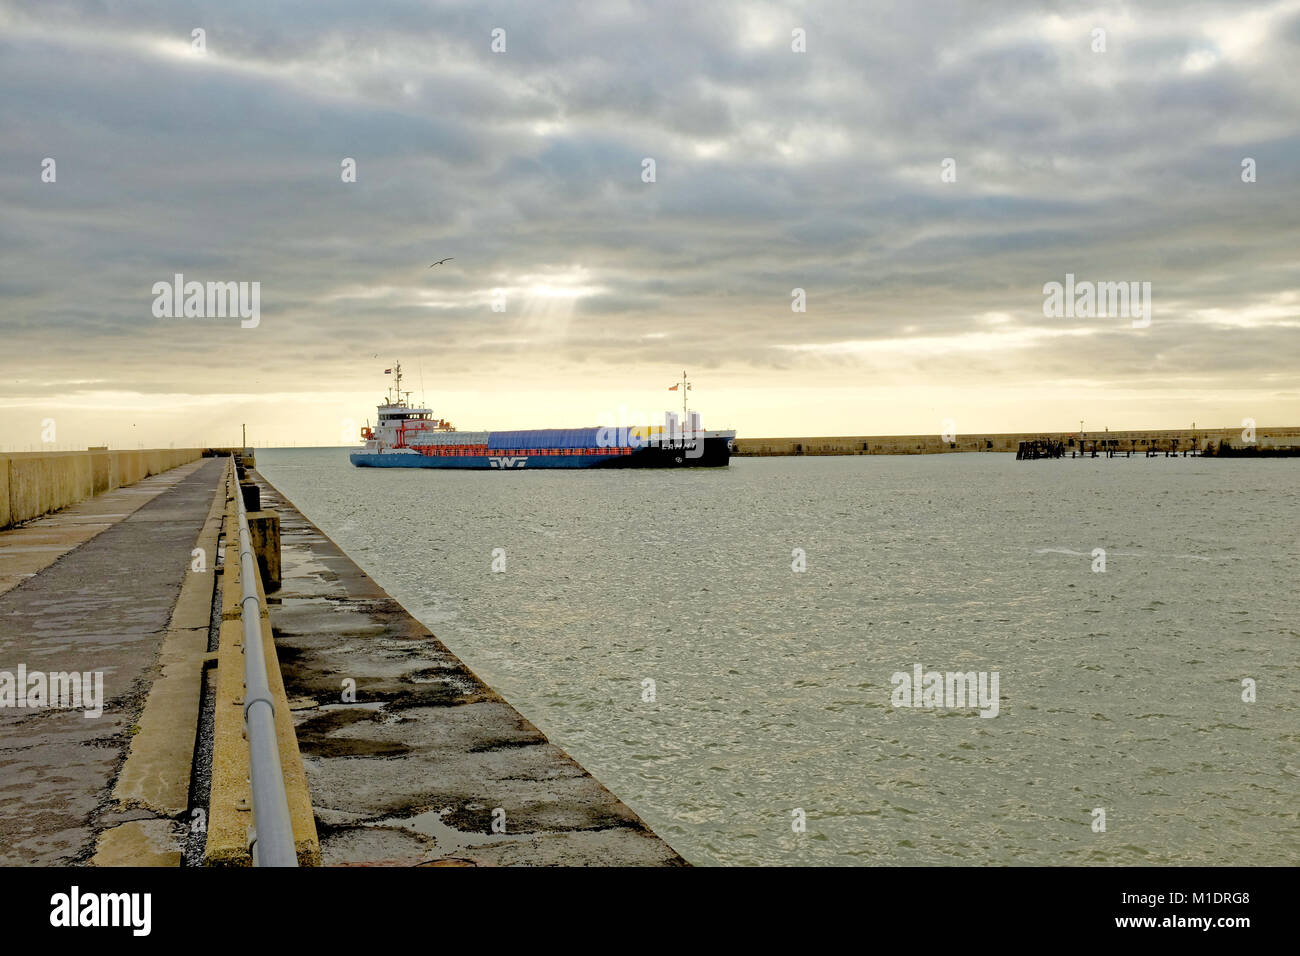 The general cargo ship Lammy enters Port Shoreham, Shoreham-by-Sea, West Sussex, England, UK. - Stock Image